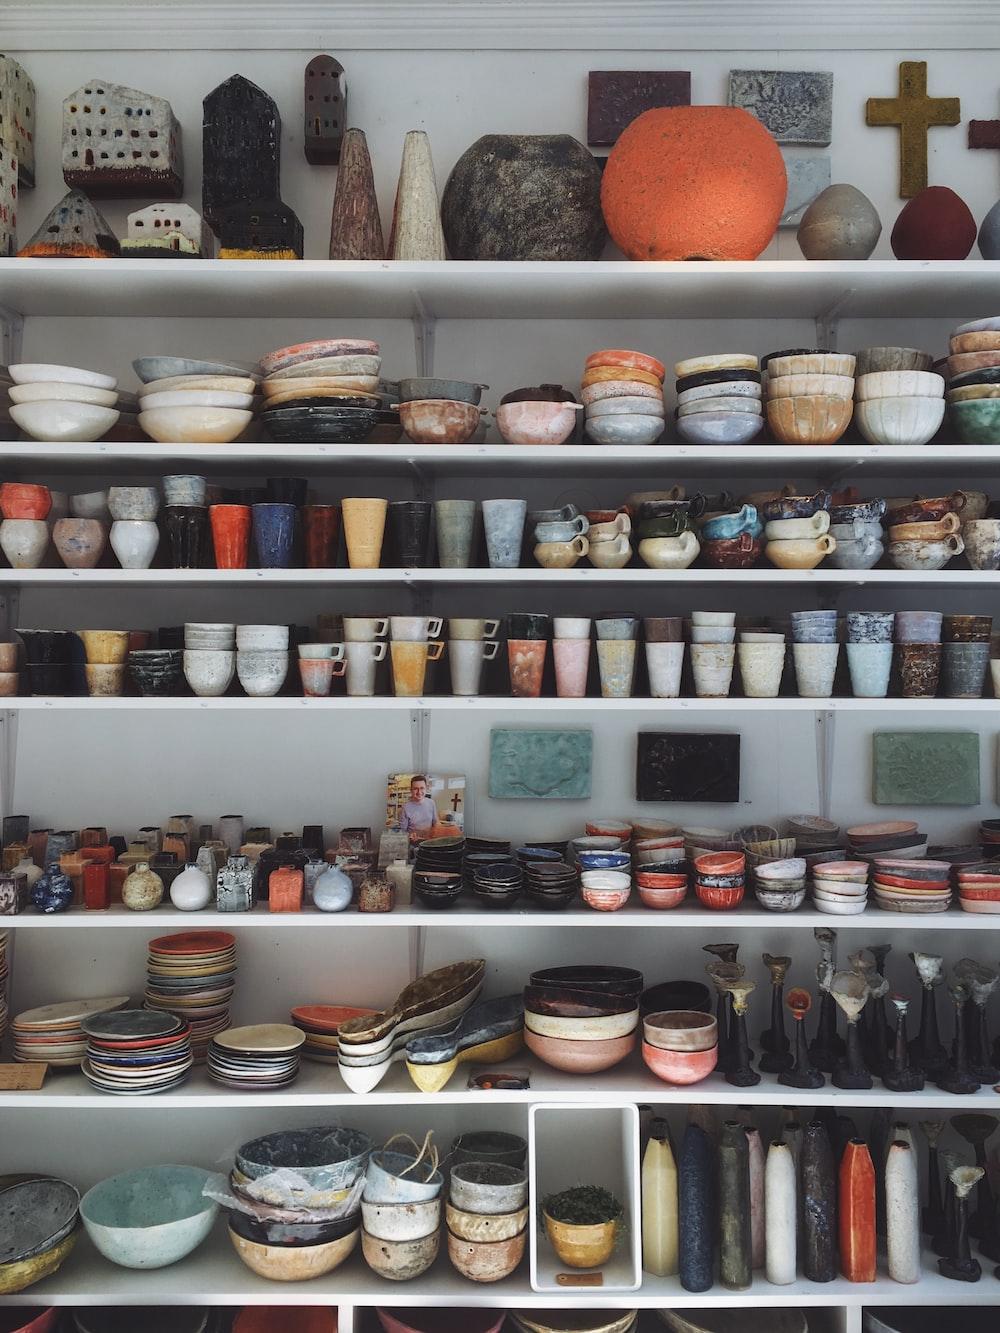 ceramic utensils lot close-up photography